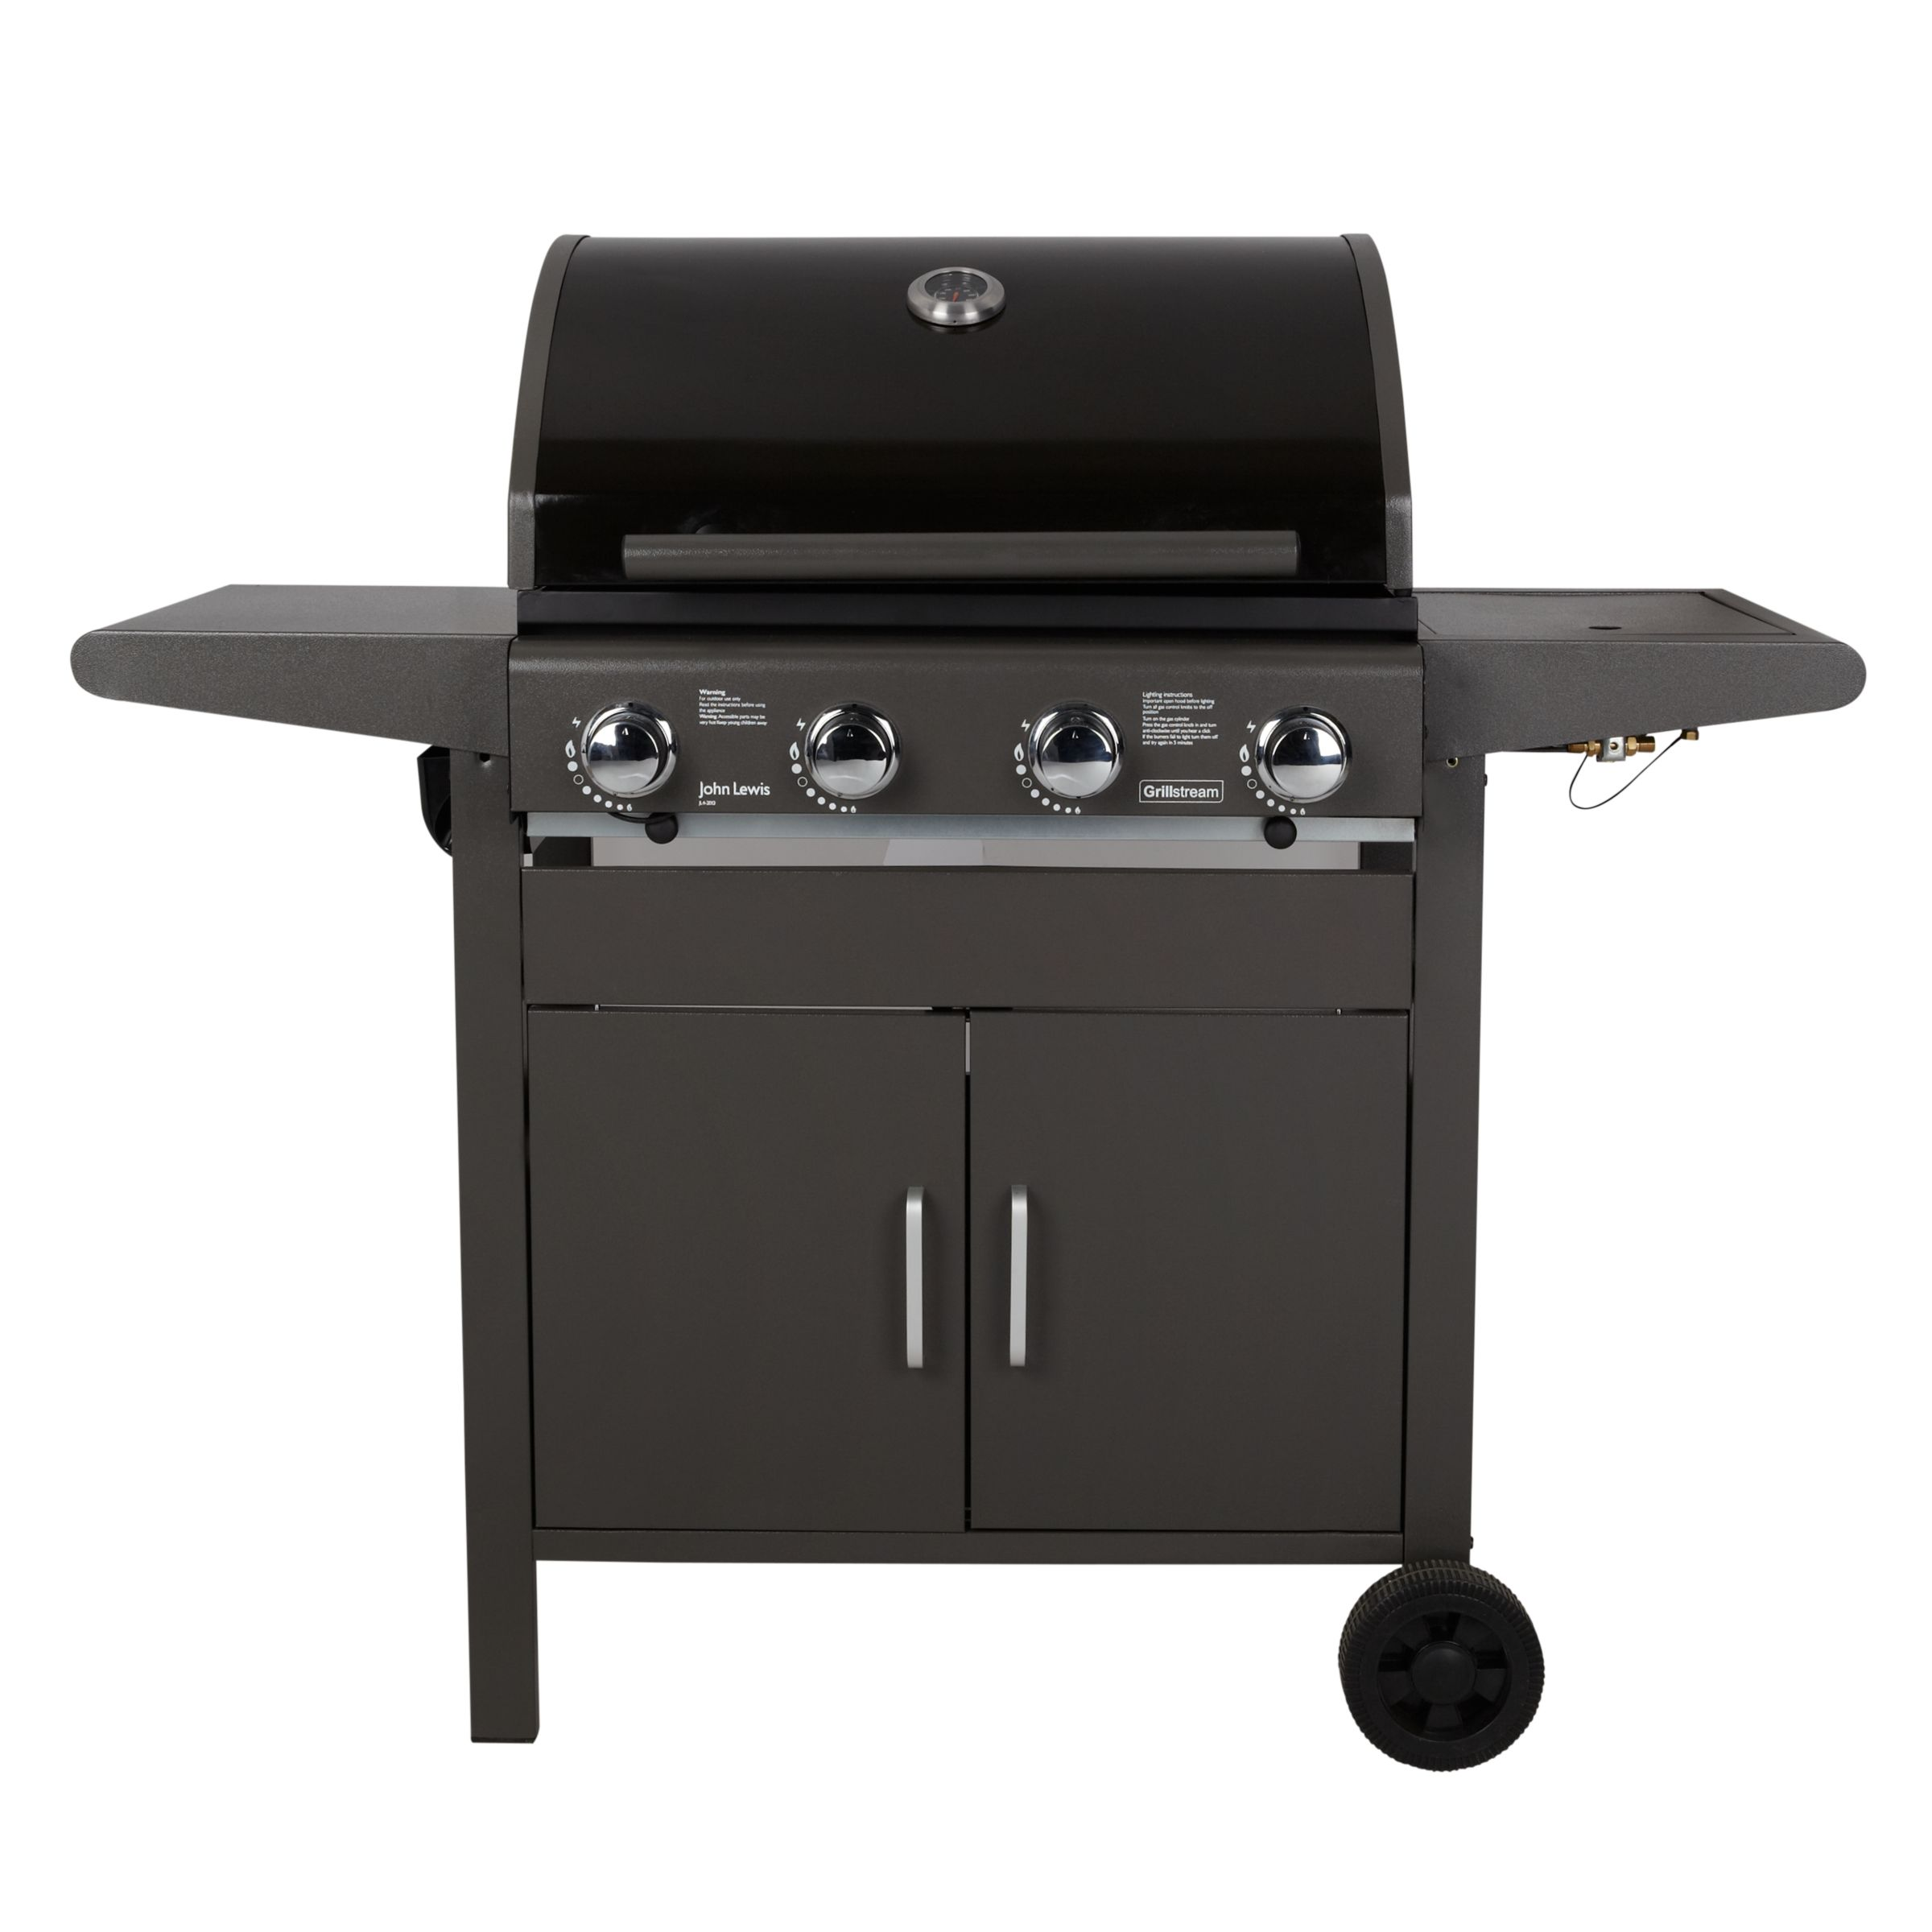 John Lewis JL4- 2013 Compact 4 Burner Cabinet Barbecue